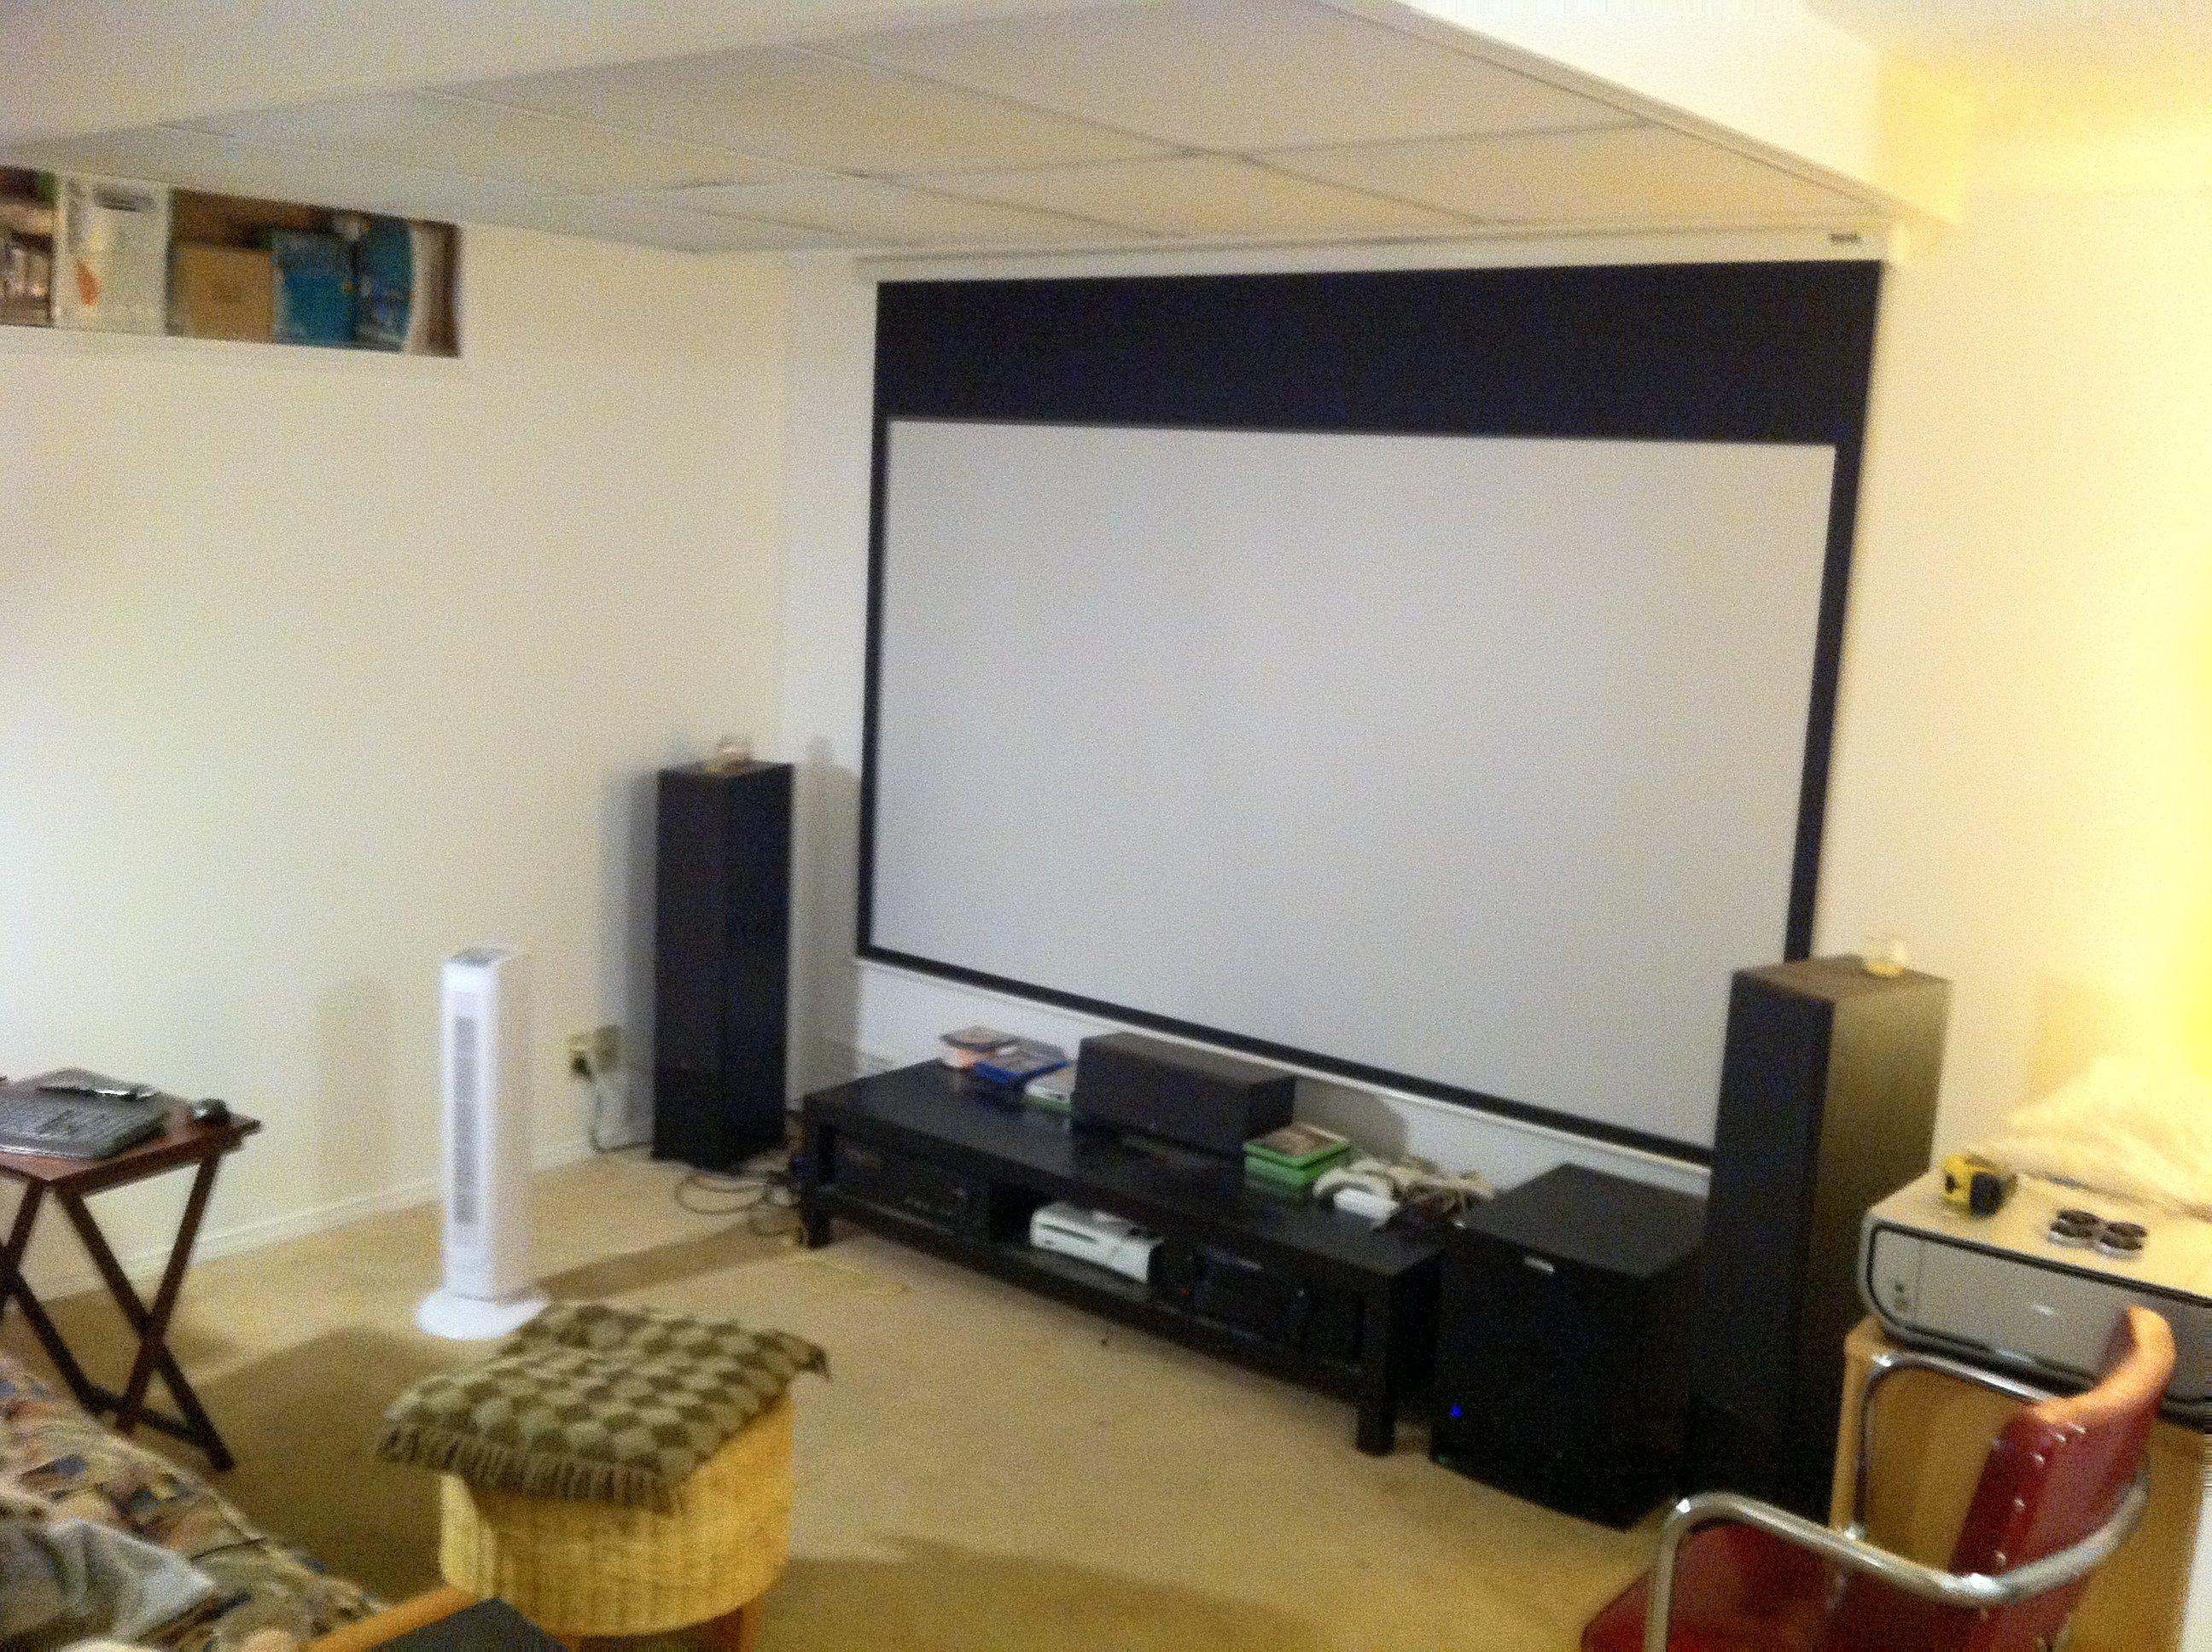 My semi-dedicated theater room rebuild - AVS Forum | Home Theater ...